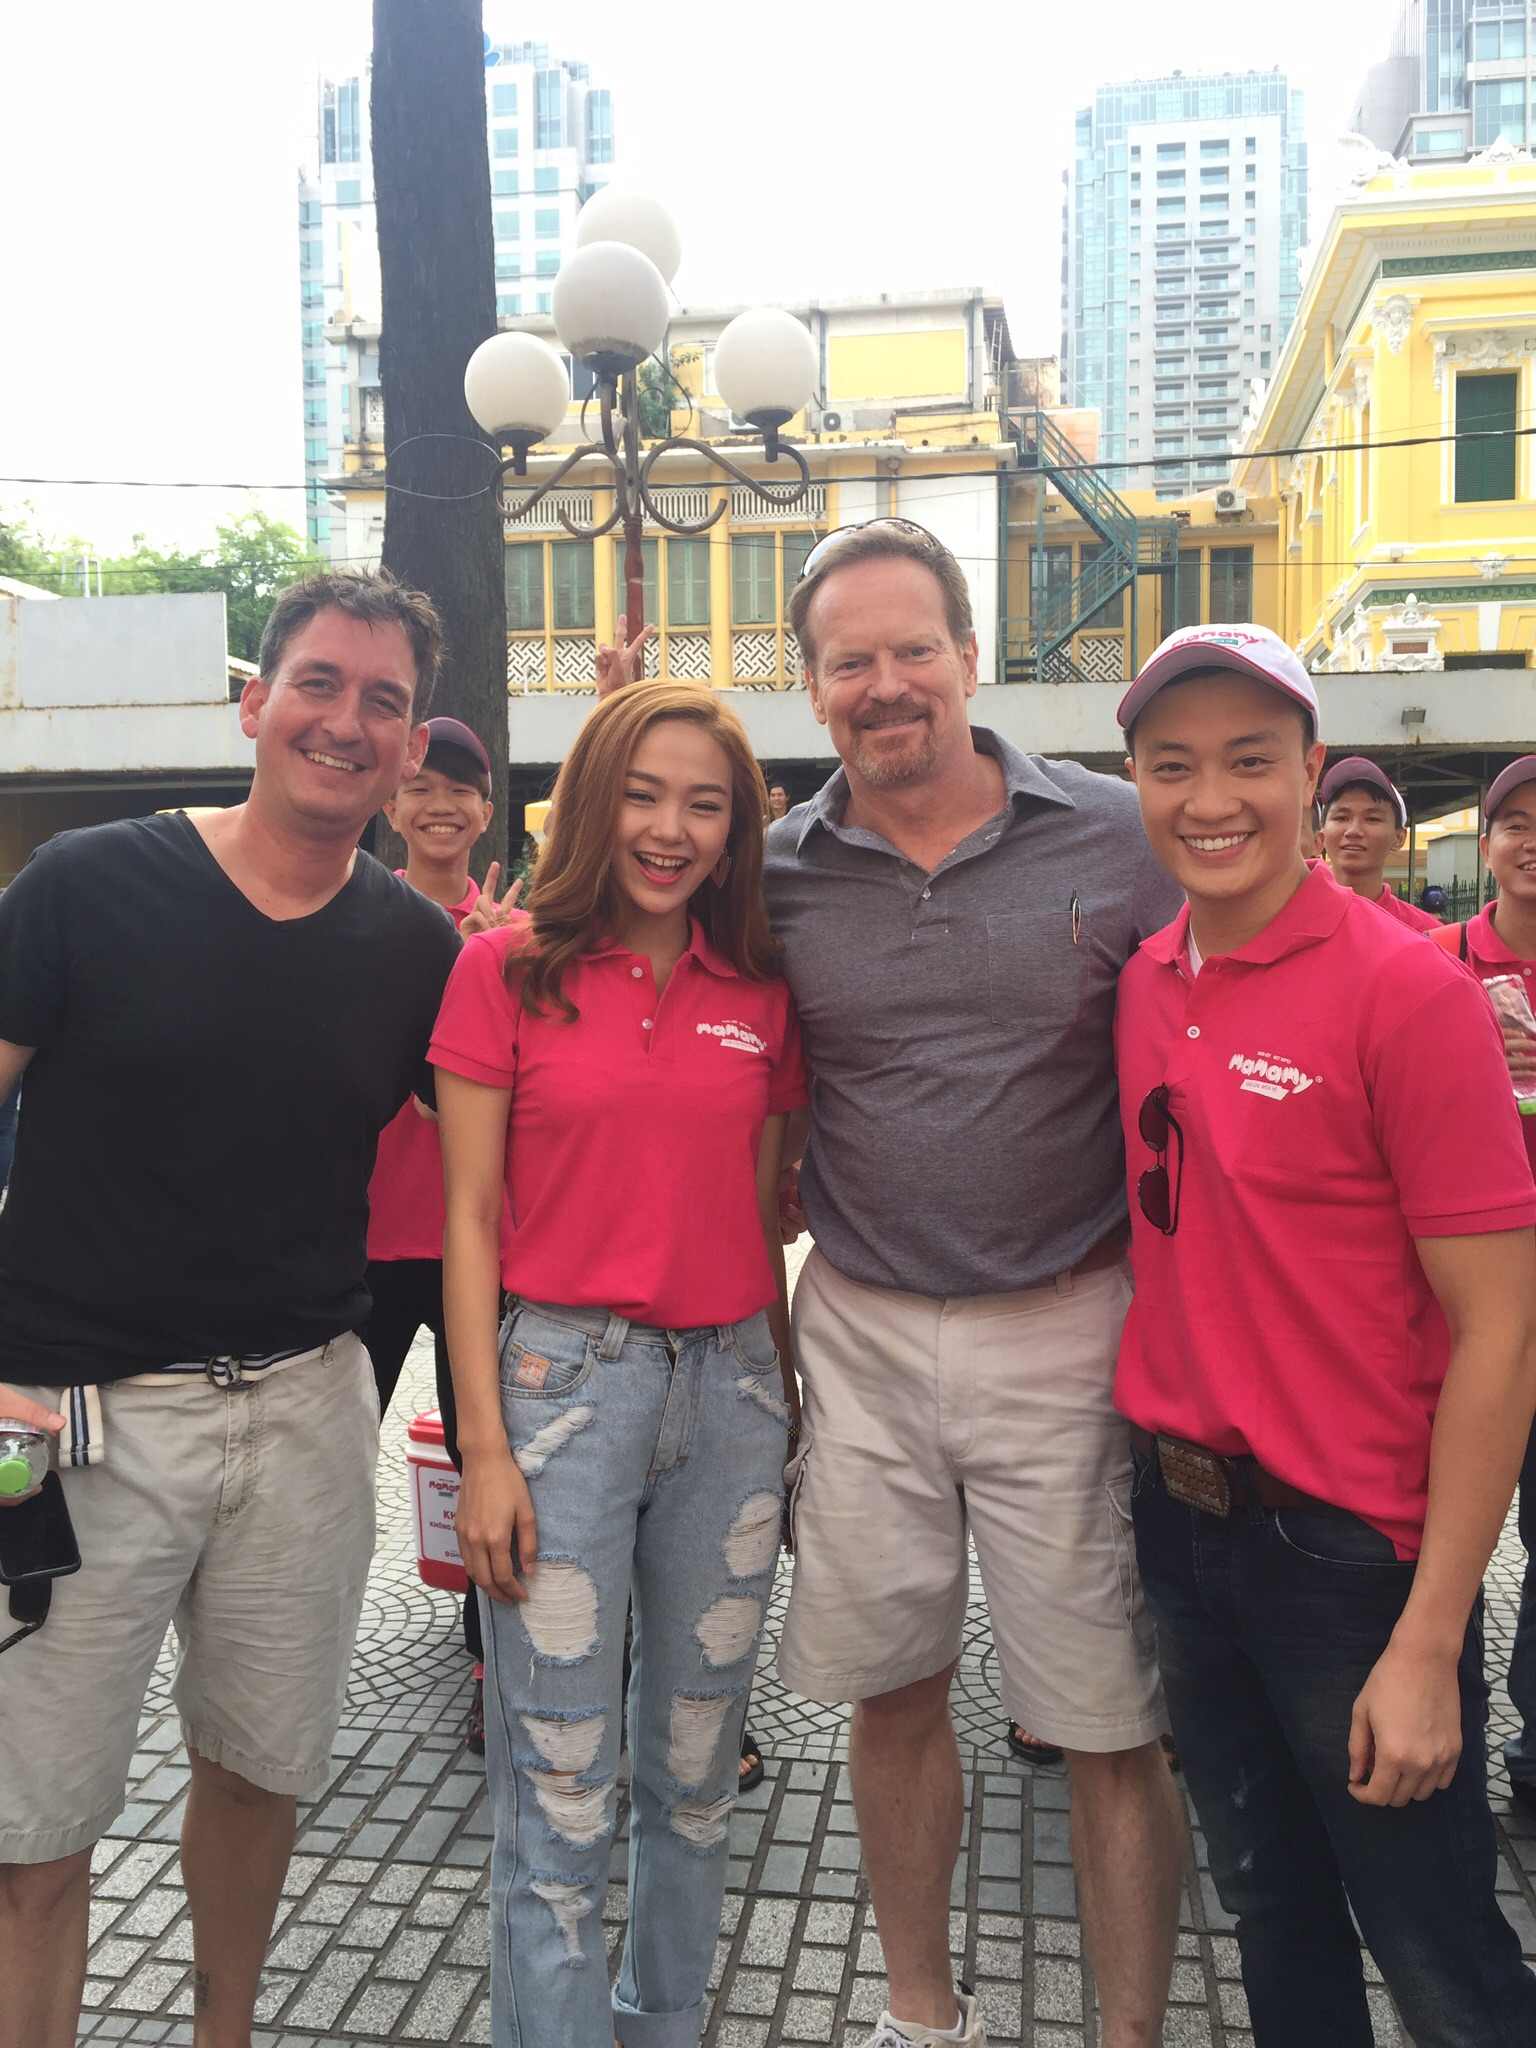 Dr. Robert Bayless, Michael Droege, and Minh Hang and Lương Mạnh Hảicelebrating water!